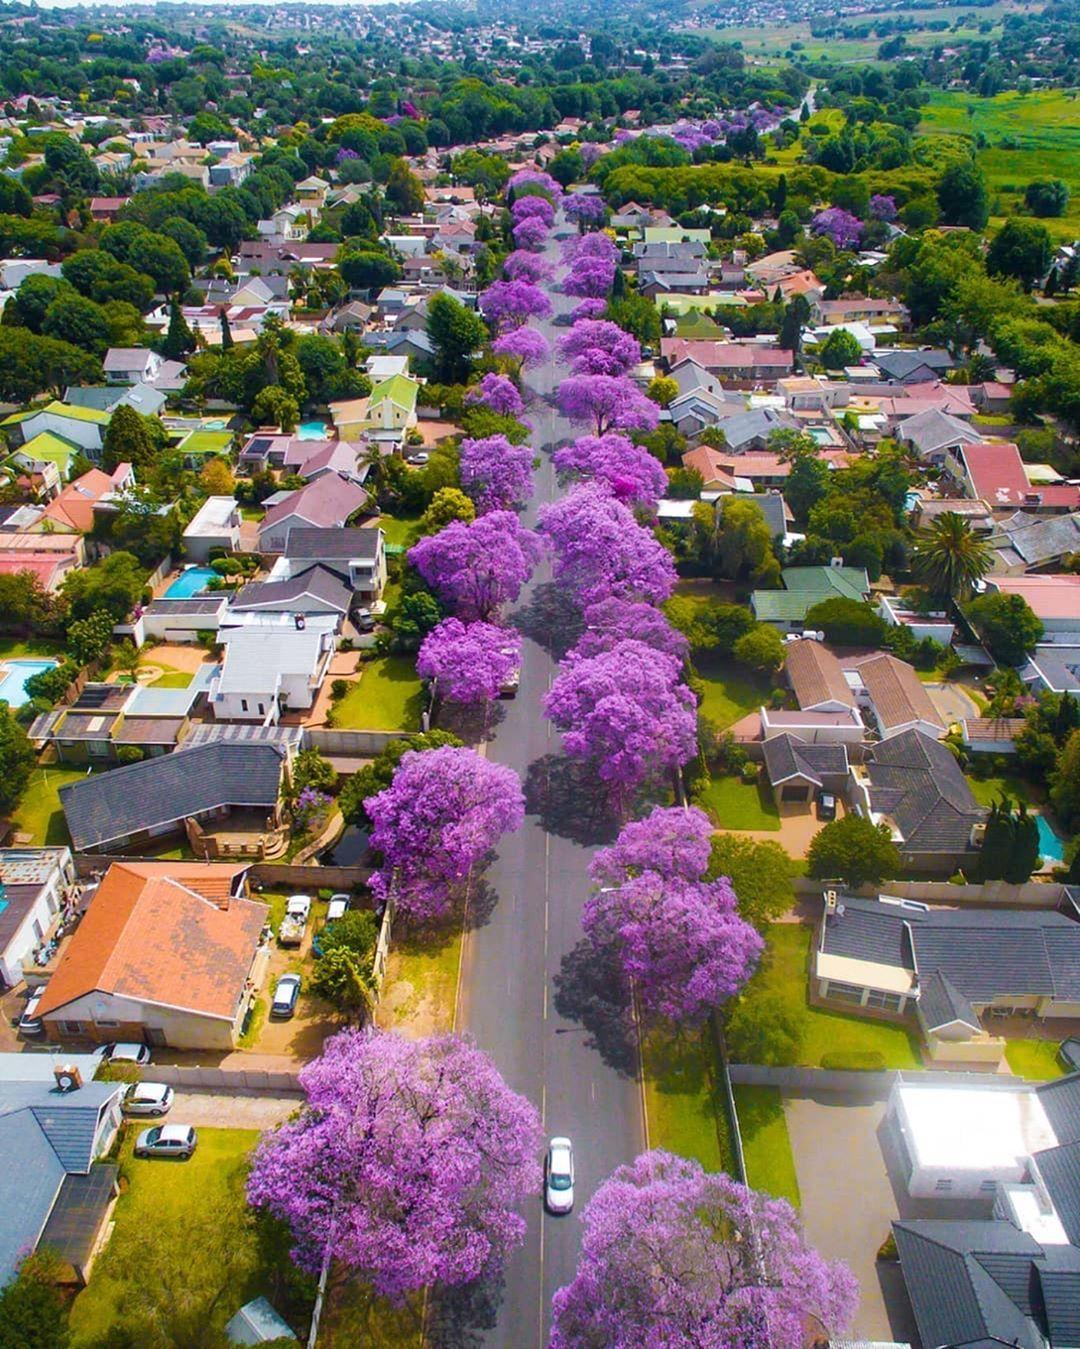 Jacaranda Blooming Trees Johannesburg South Africa Photos By Jacaranda Blooming Trees Johannesburg South Jacaranda Tree Johannesburg Blooming Trees